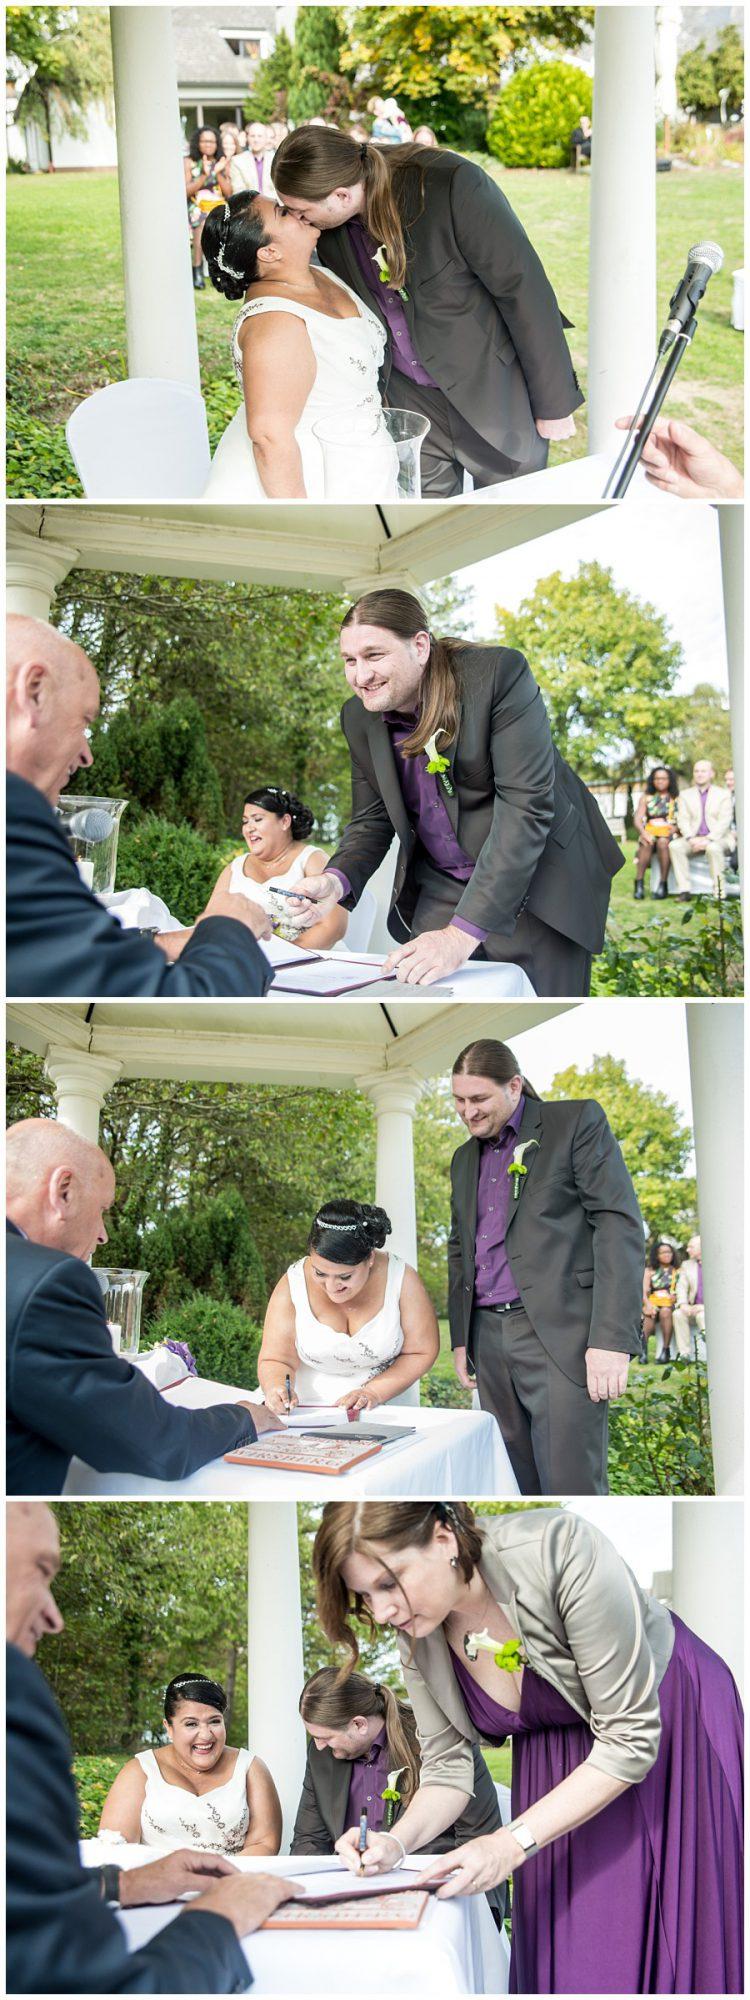 Hochzeit_Reitershof_Wirsberg_Claudia-Pelny-Fotografie_17